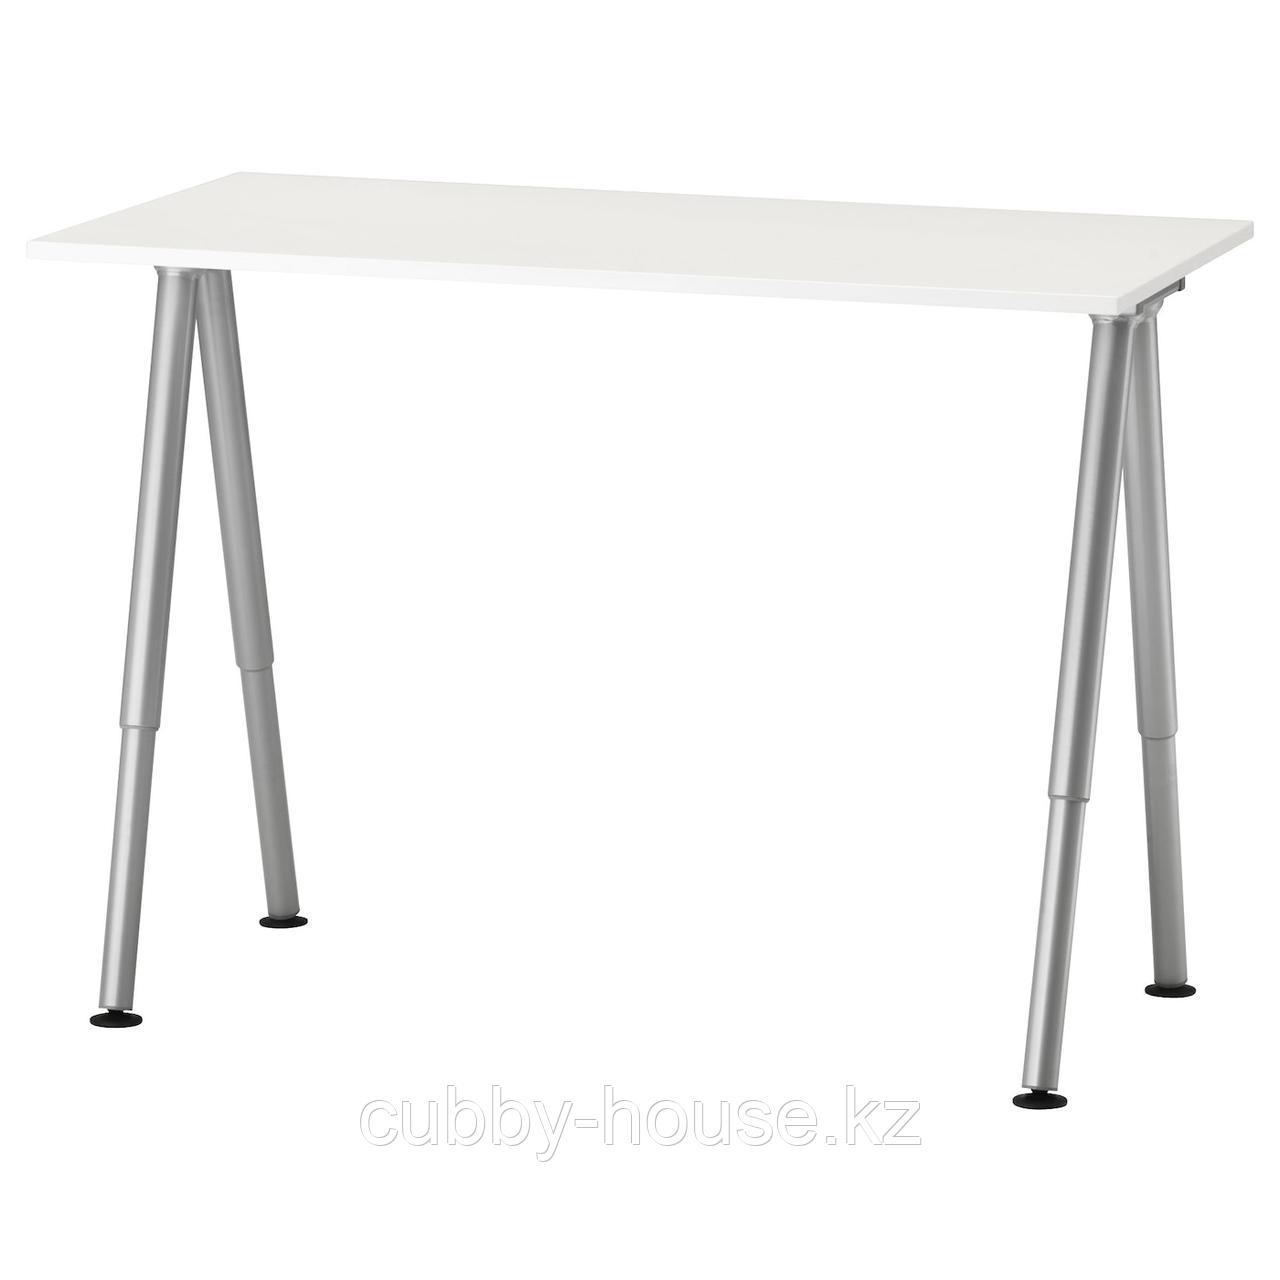 ТИГЕ Письменный стол, белый, серебристый, 120x60 см